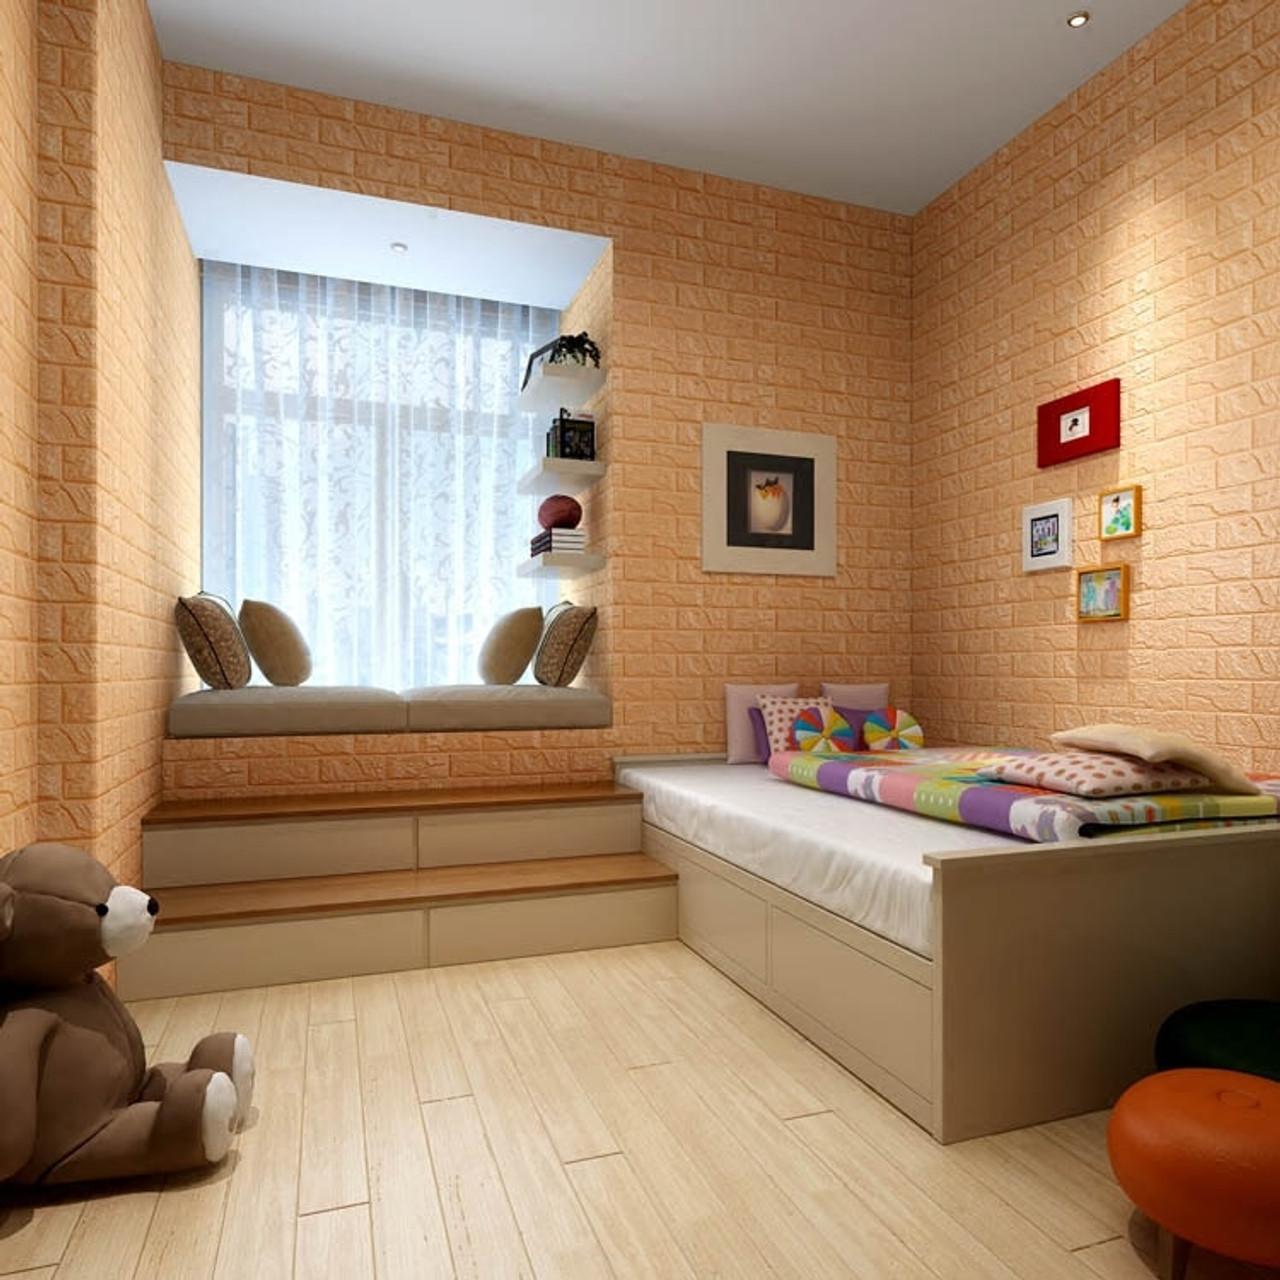 ... 3D Wall Panel Stickers Living Room 3D Brick Wallpaper For Kids Room  Bedroom Home Decor 3D ...